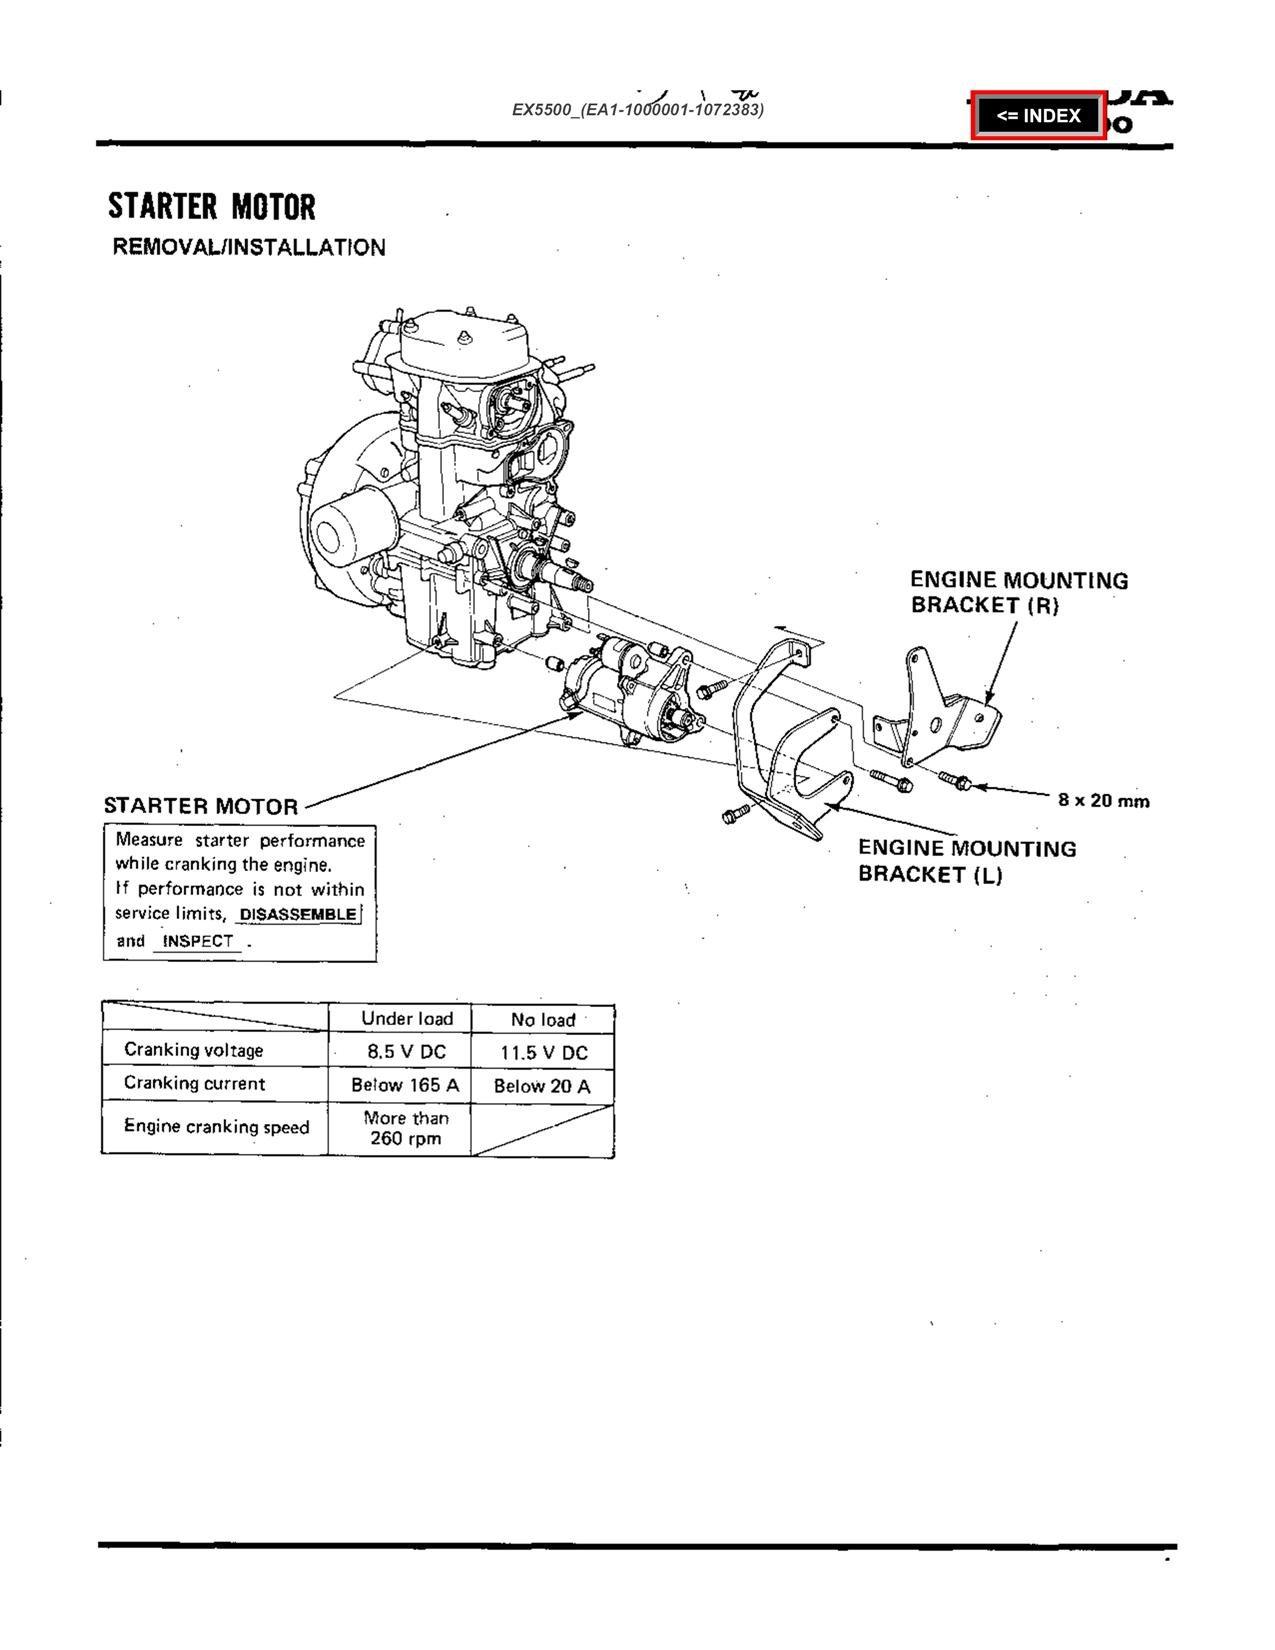 how do i remove the starter from my honda ex5500 generator rh justanswer com EX5500 Honda Engine honda el5000 es6500 ex5500 generator service repair shop manual